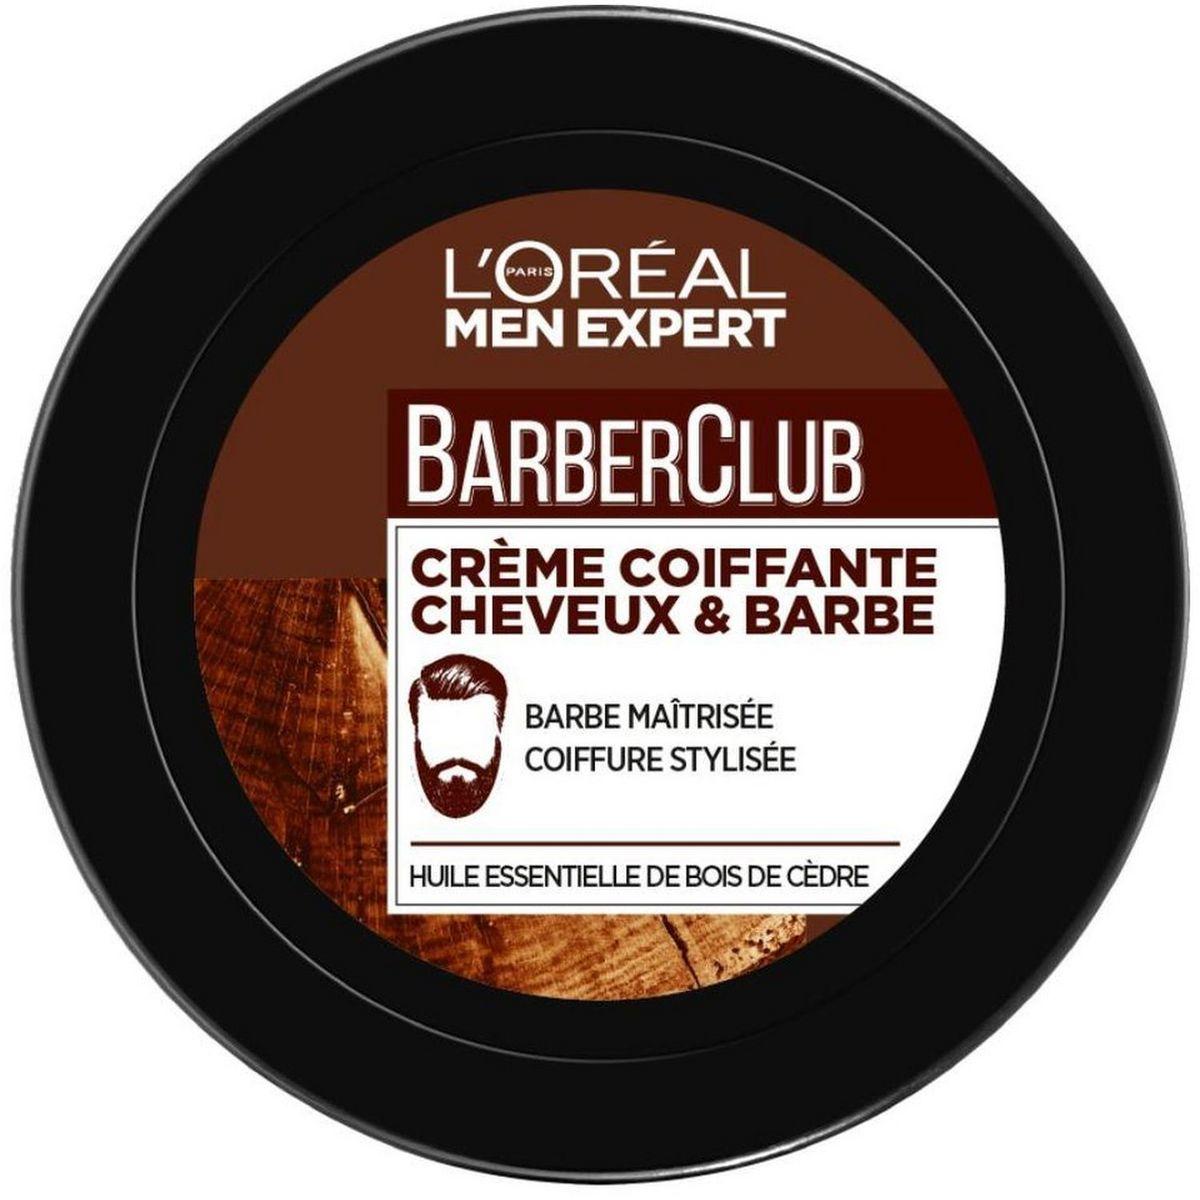 L'Oréal Barber Club crème coiffante cheveux & barbe 75ml